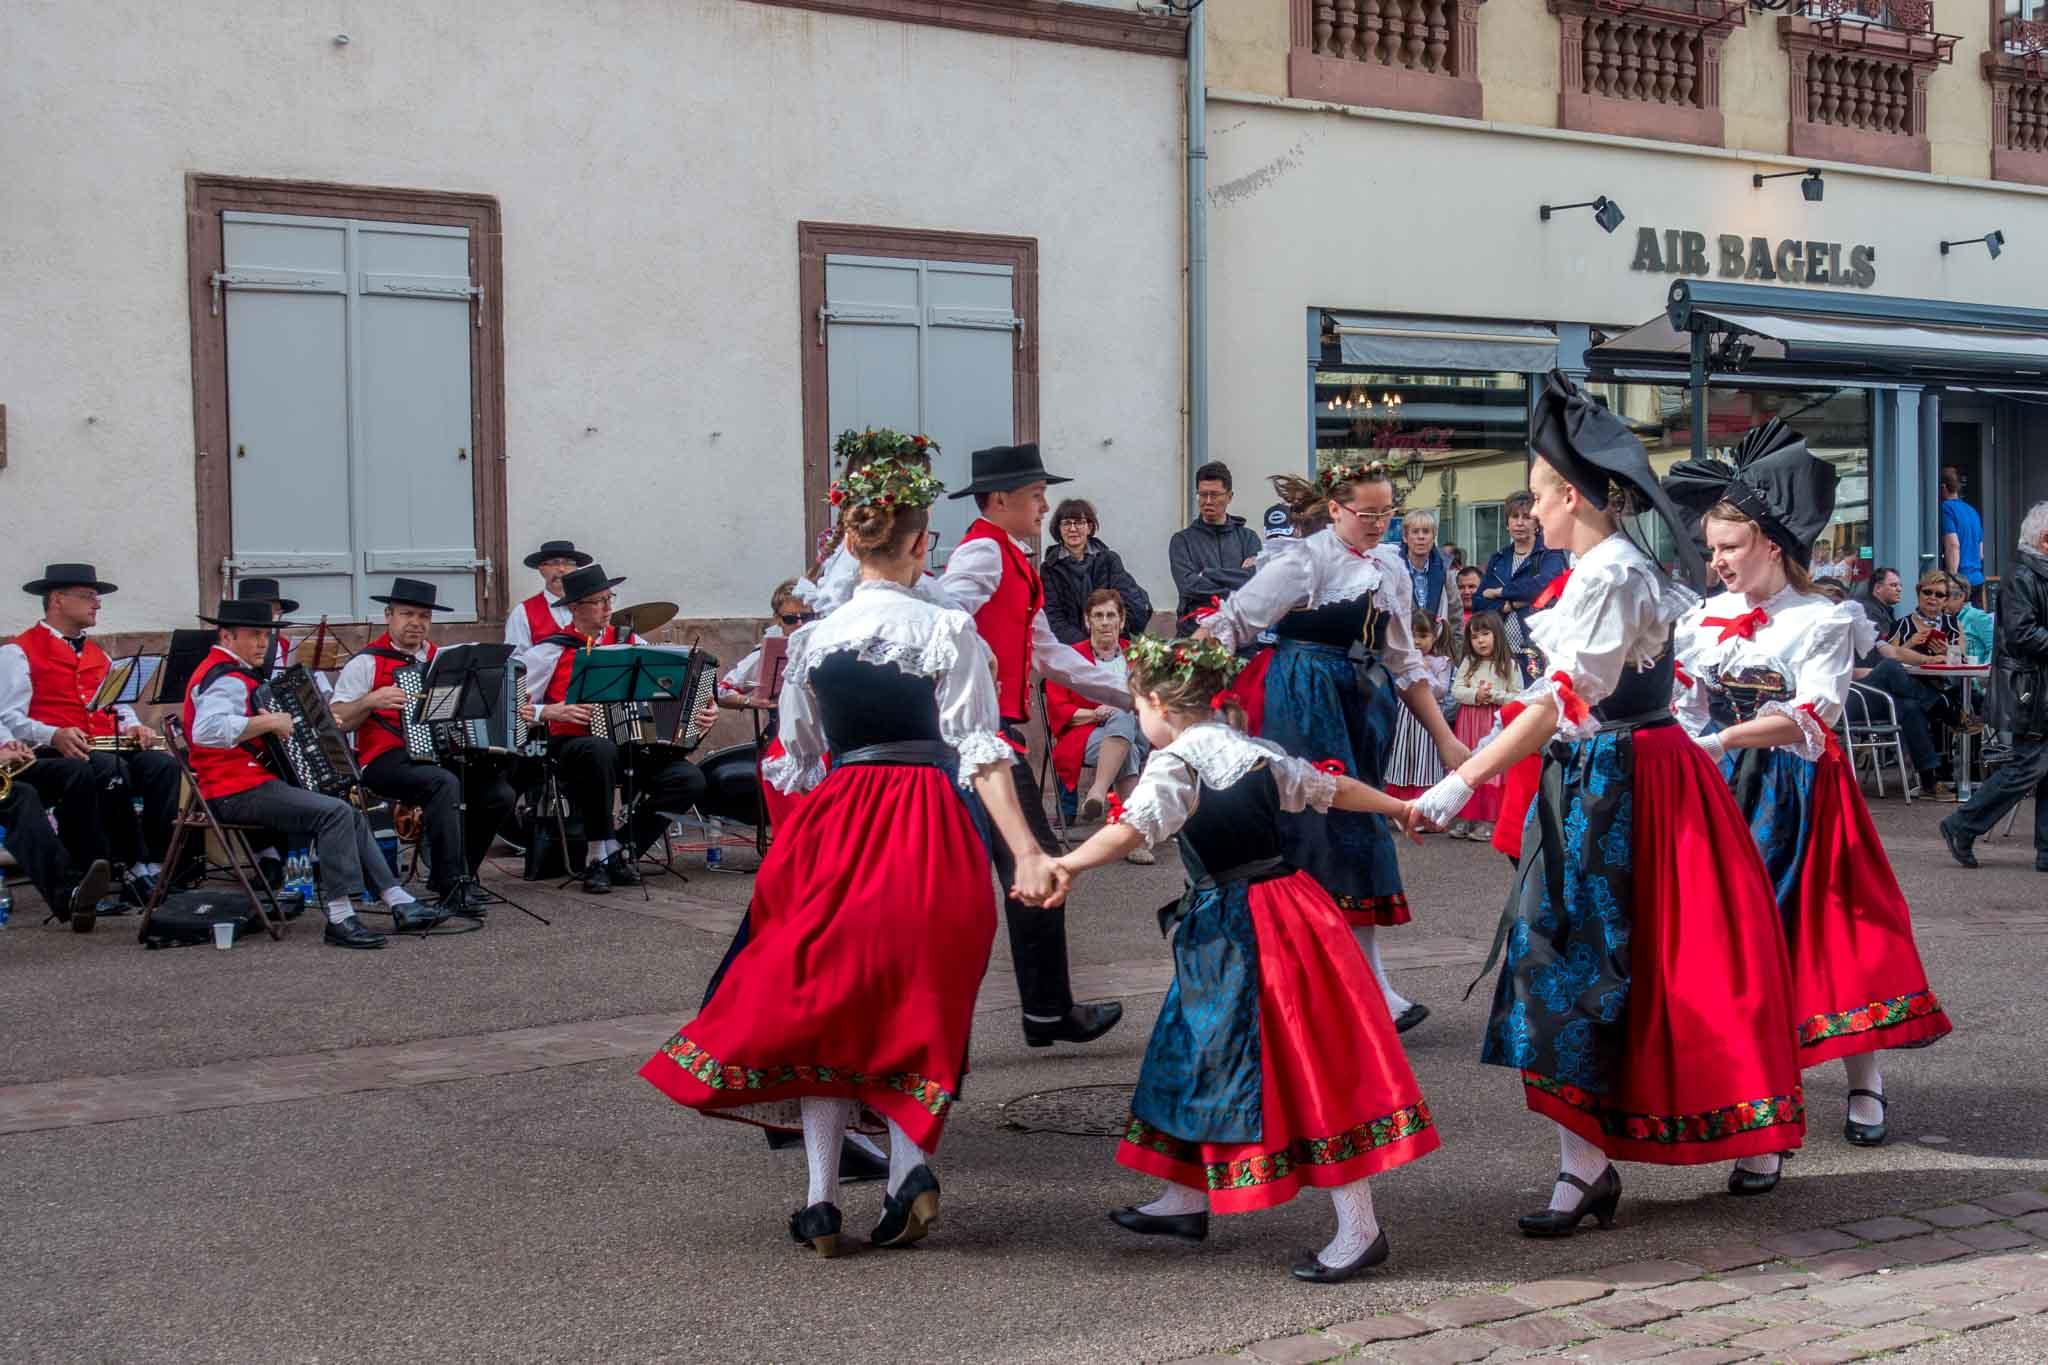 People dancing in traditional Alsatian clothing